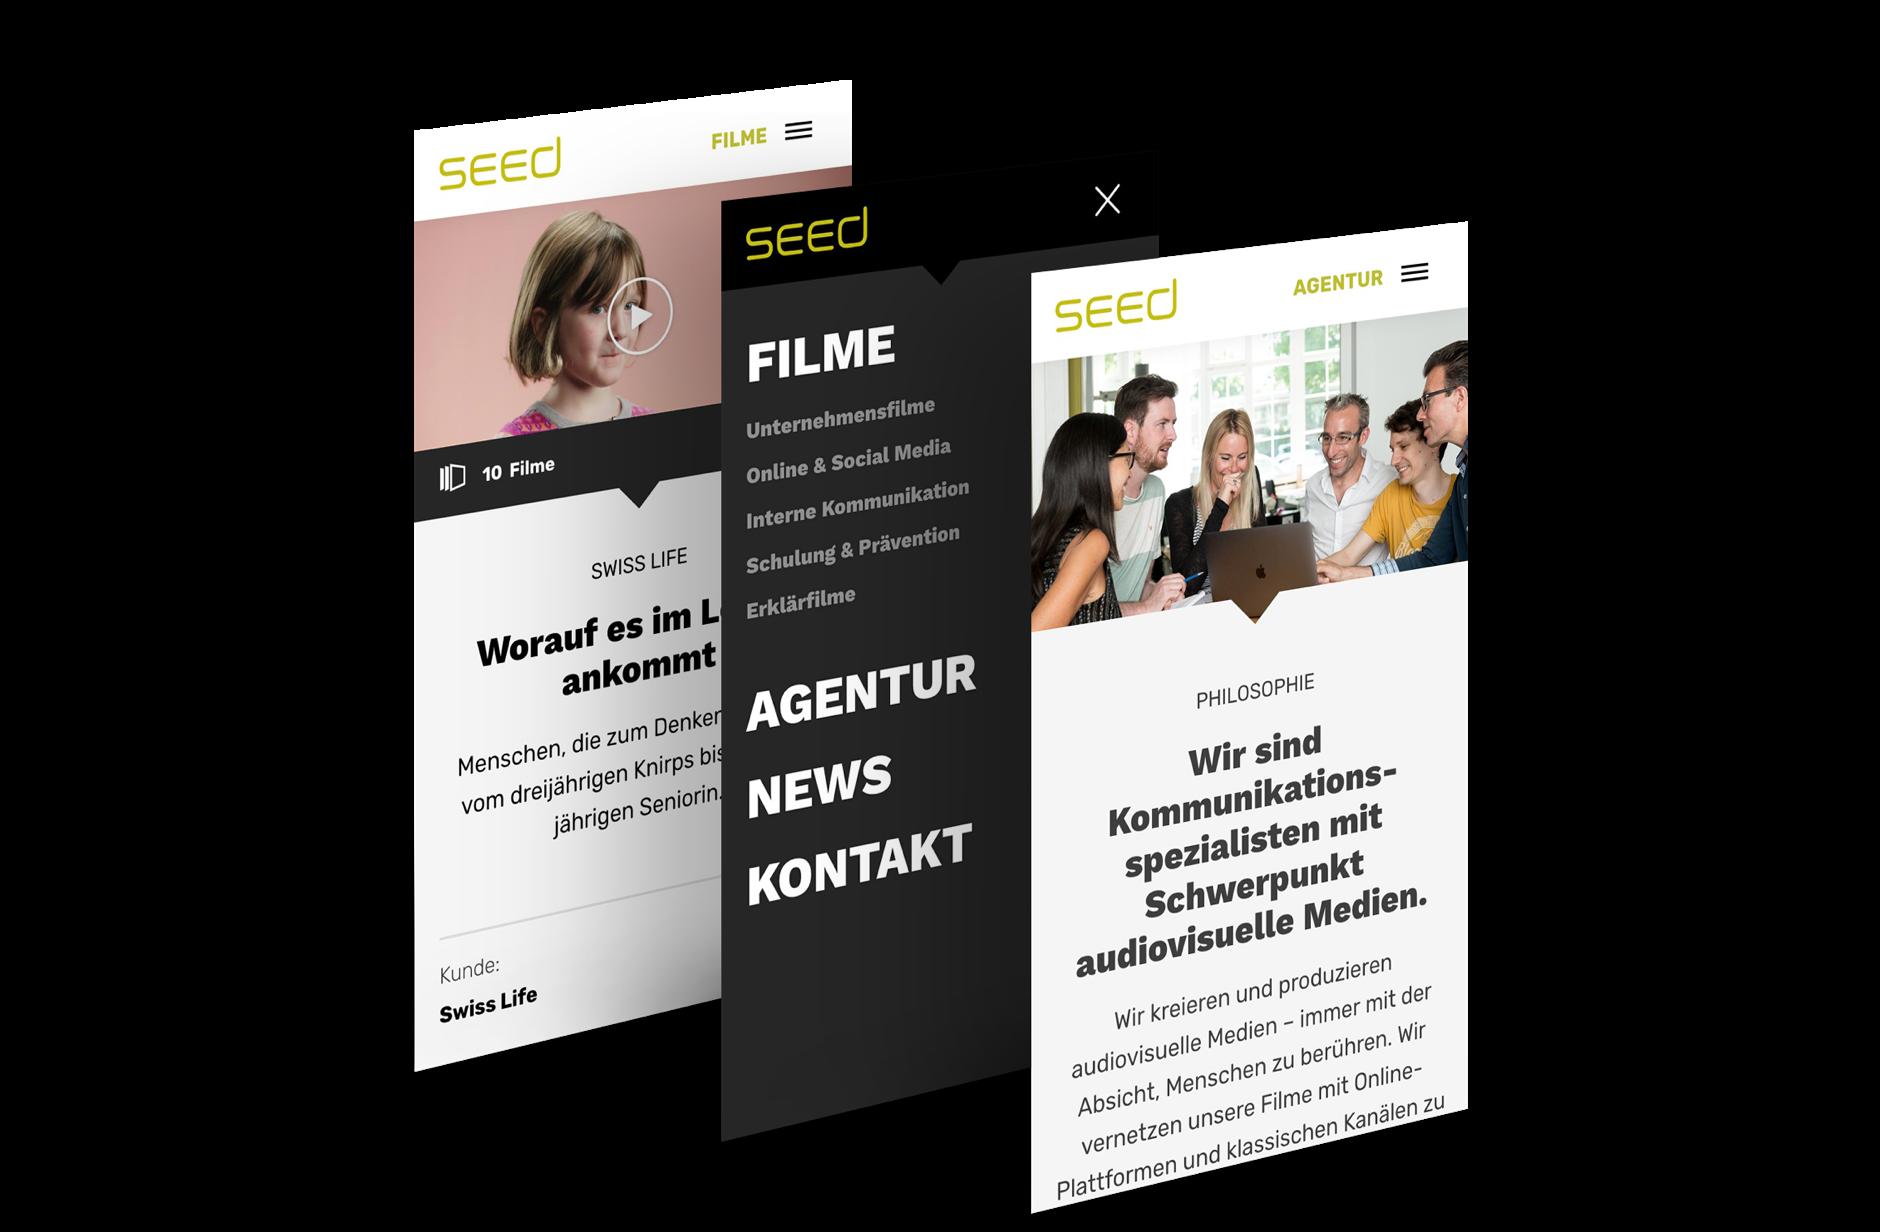 Website für Seed Audio-Visual Communication